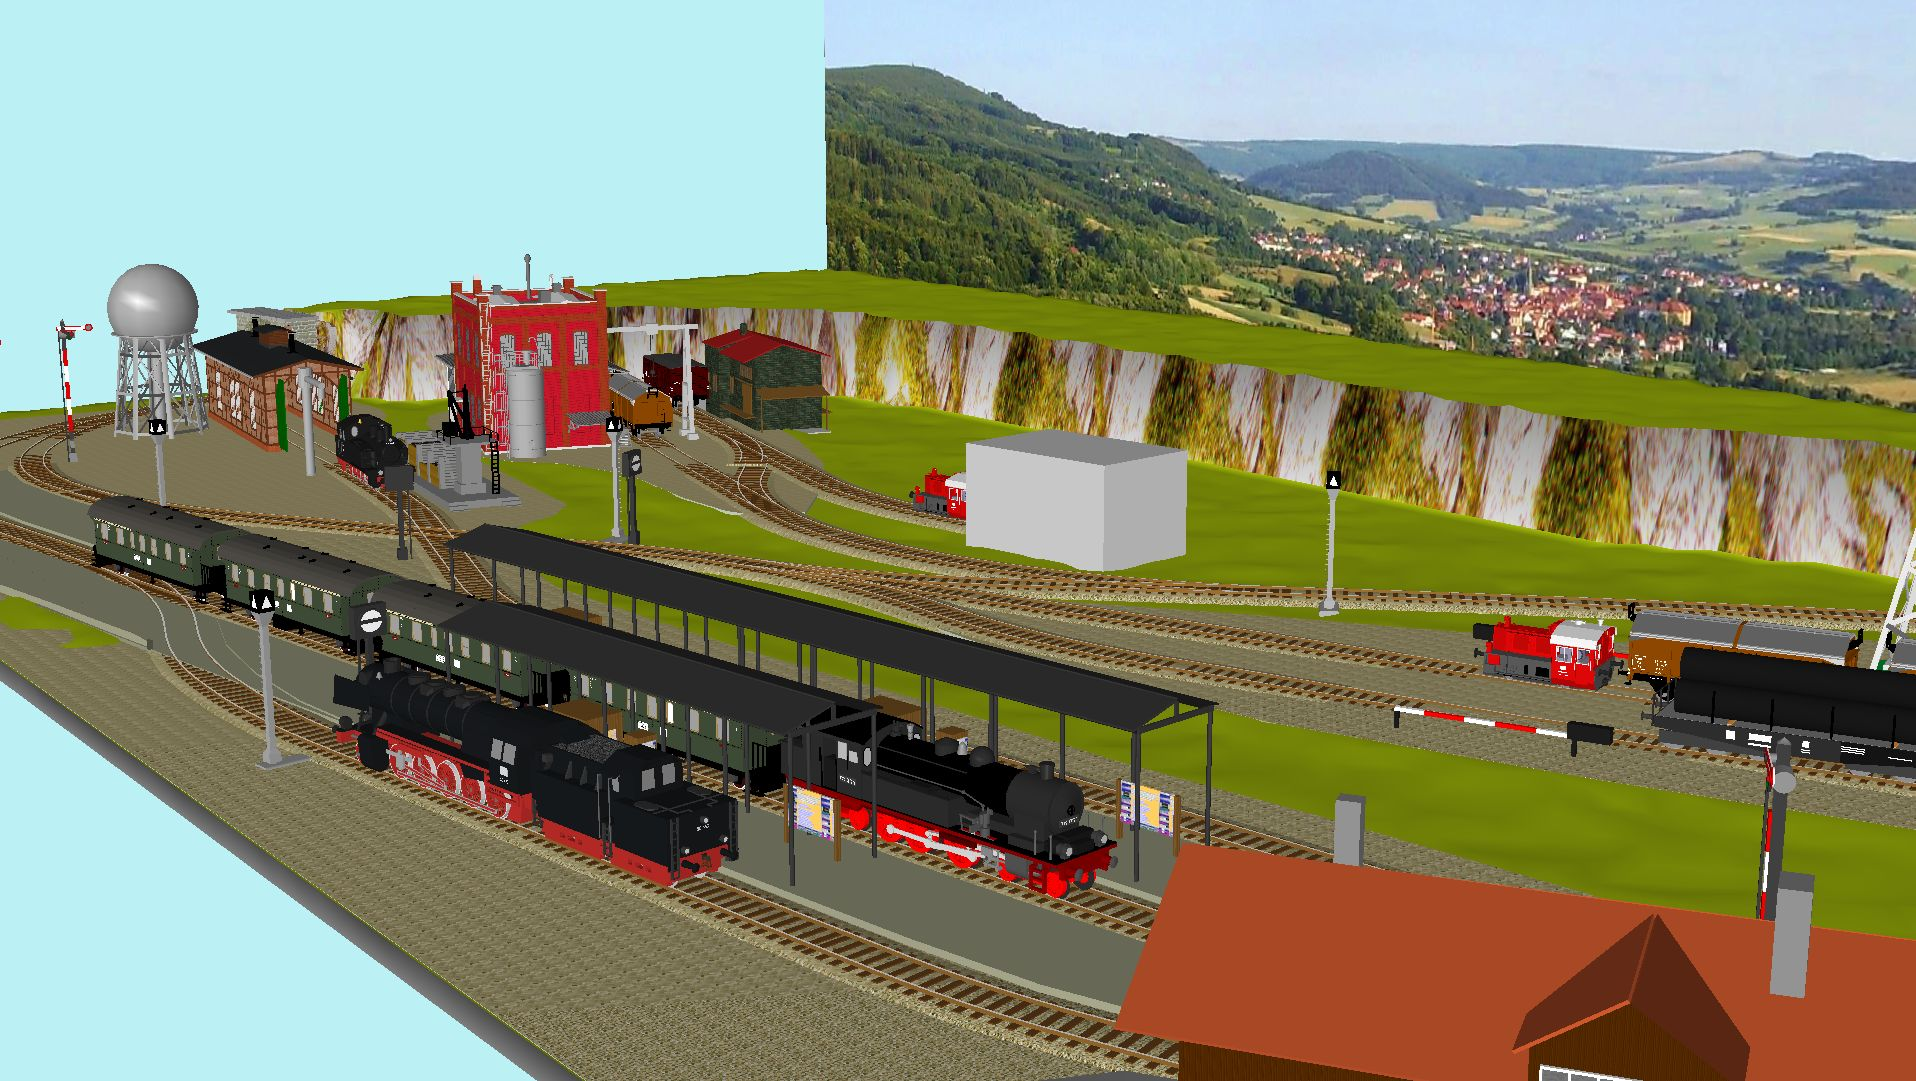 'ALBA Modellbahnpraxis' Band 1, Plan 5 Amp-1_5_m-gleis_jrg_a1nj3l